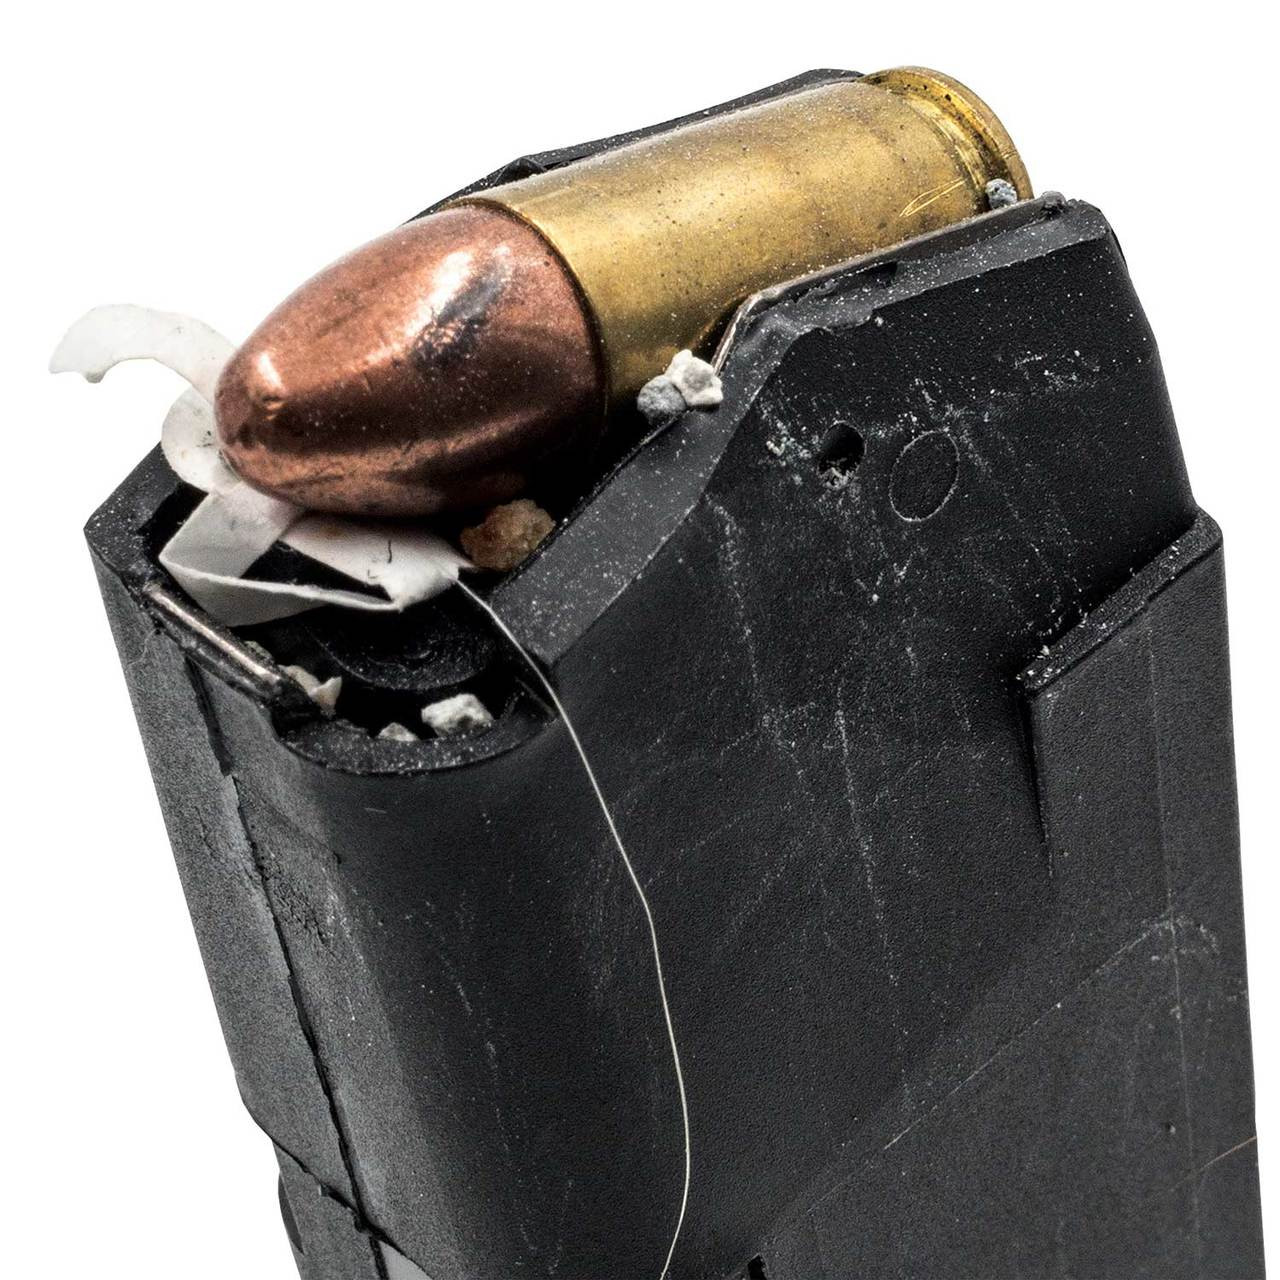 Beretta 92 Compact Magazine Sleeve